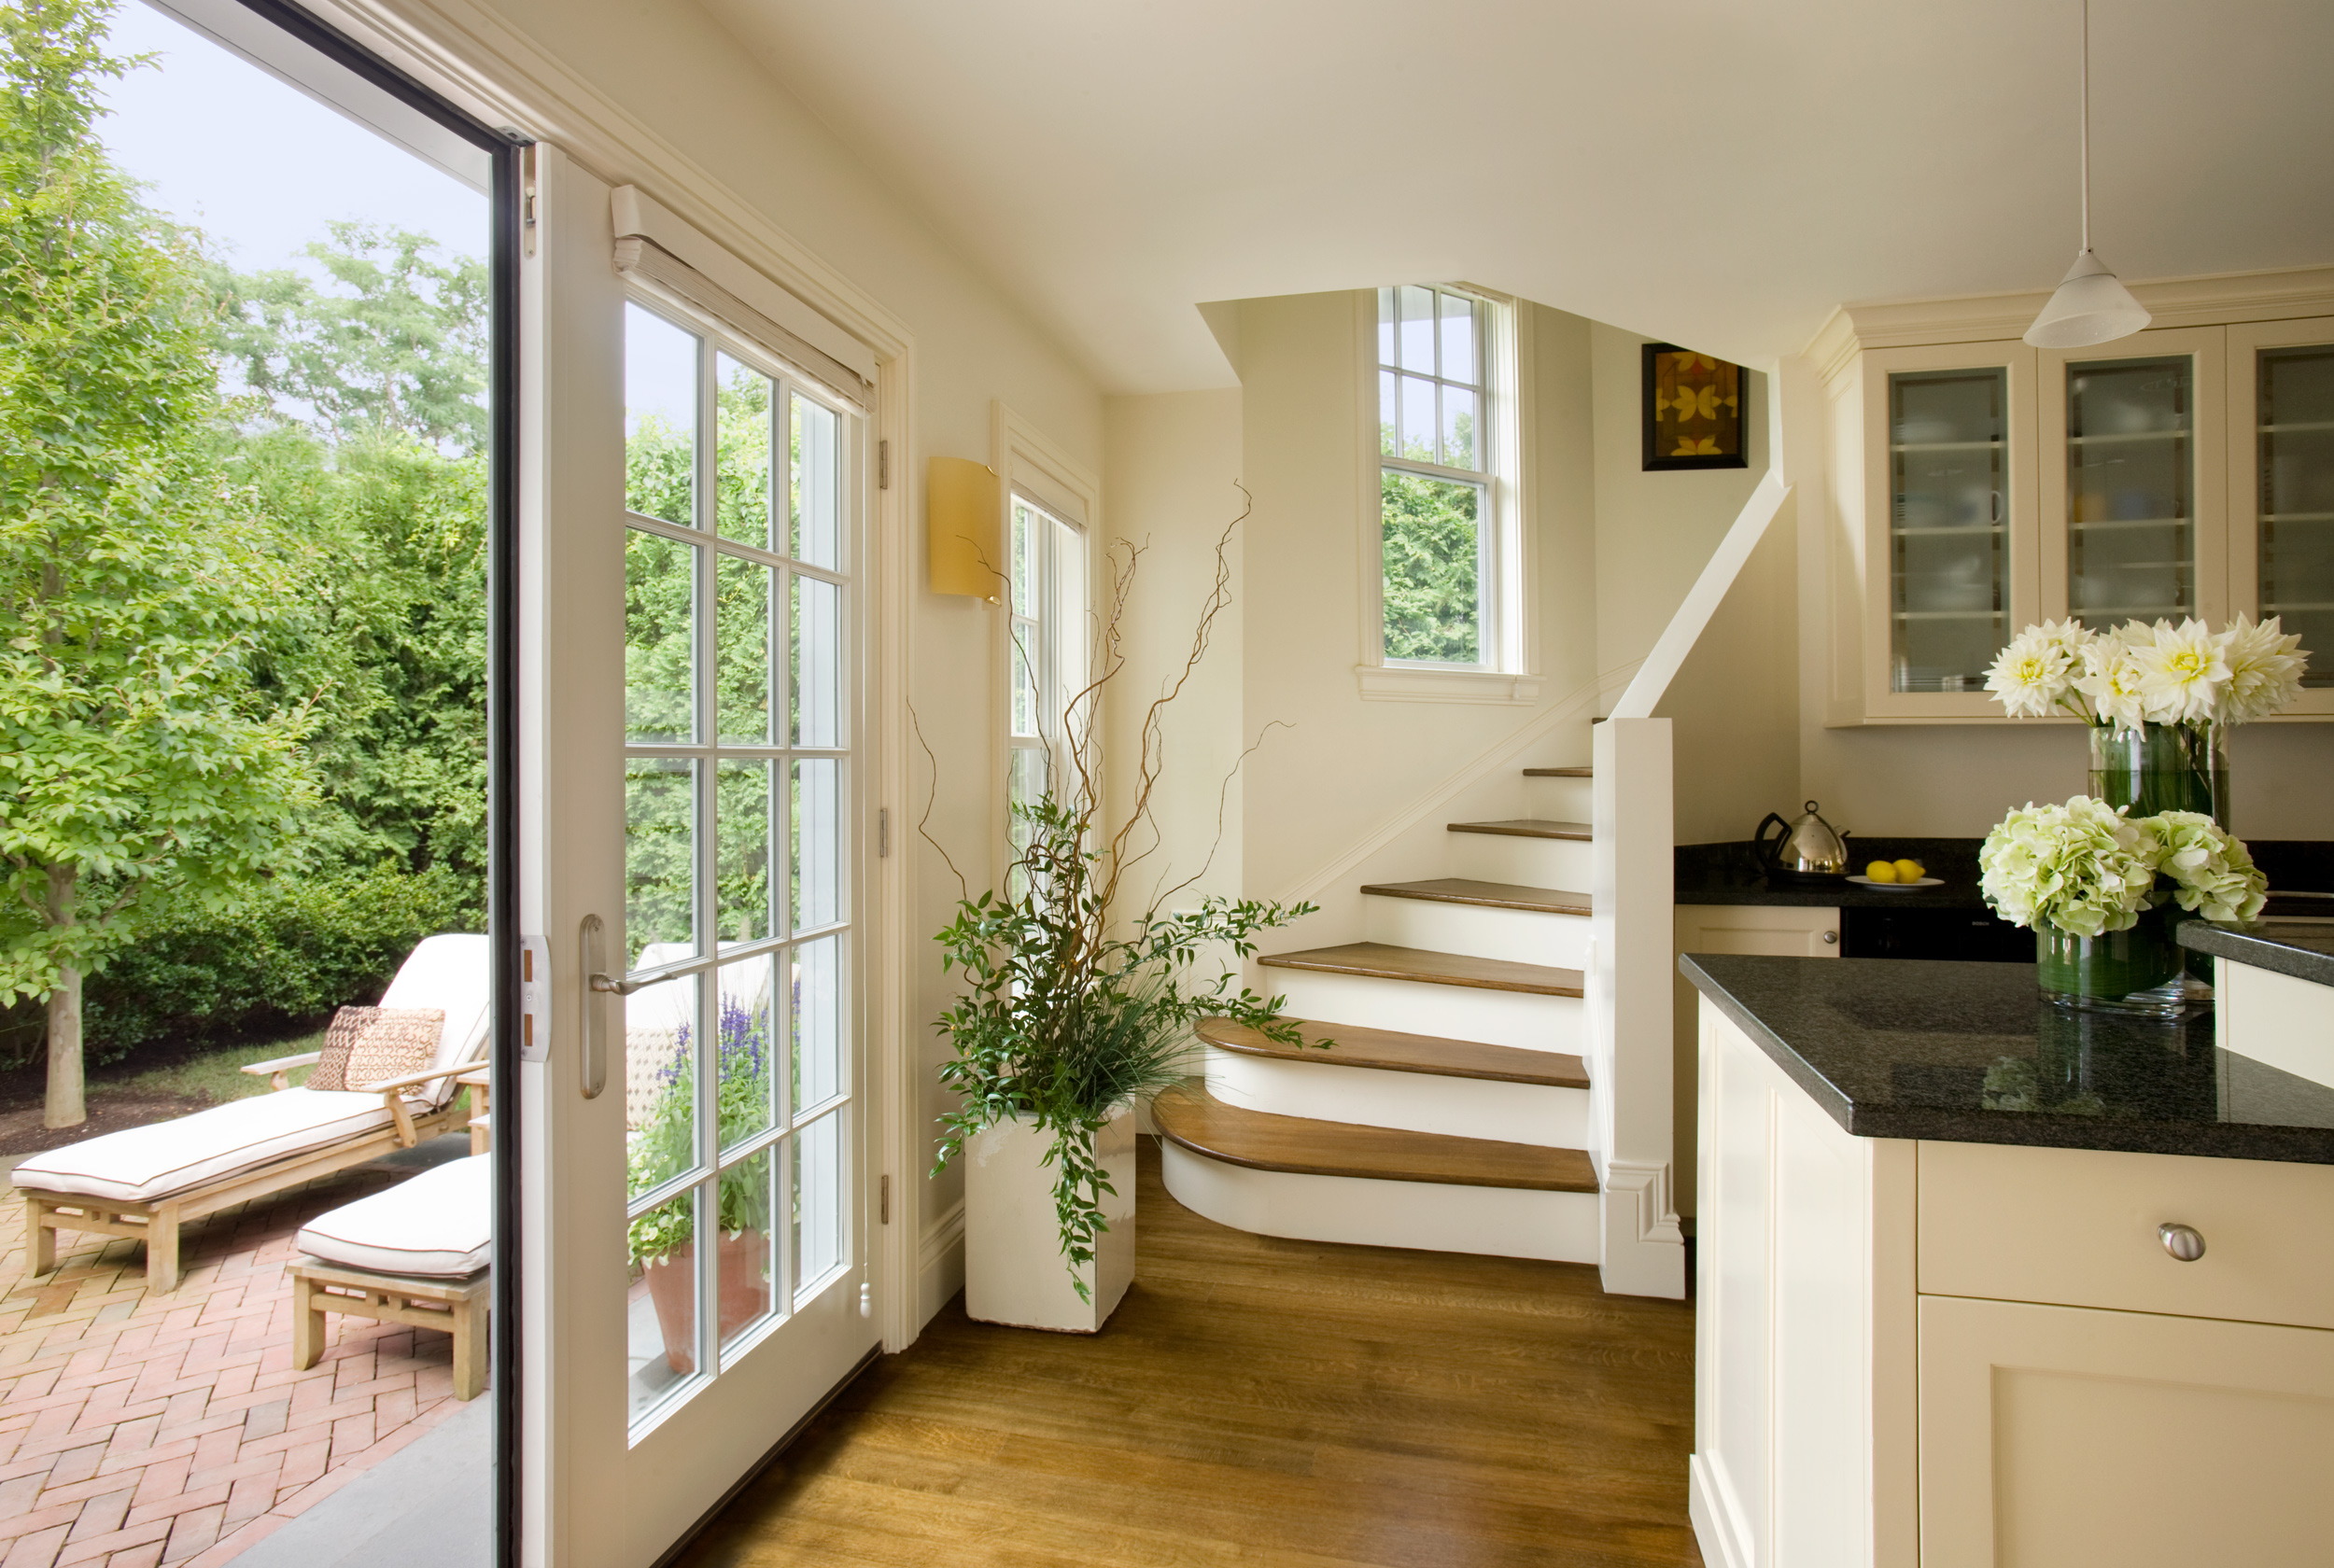 Cape_Cod_Doreve_yellow_kitchen.jpg